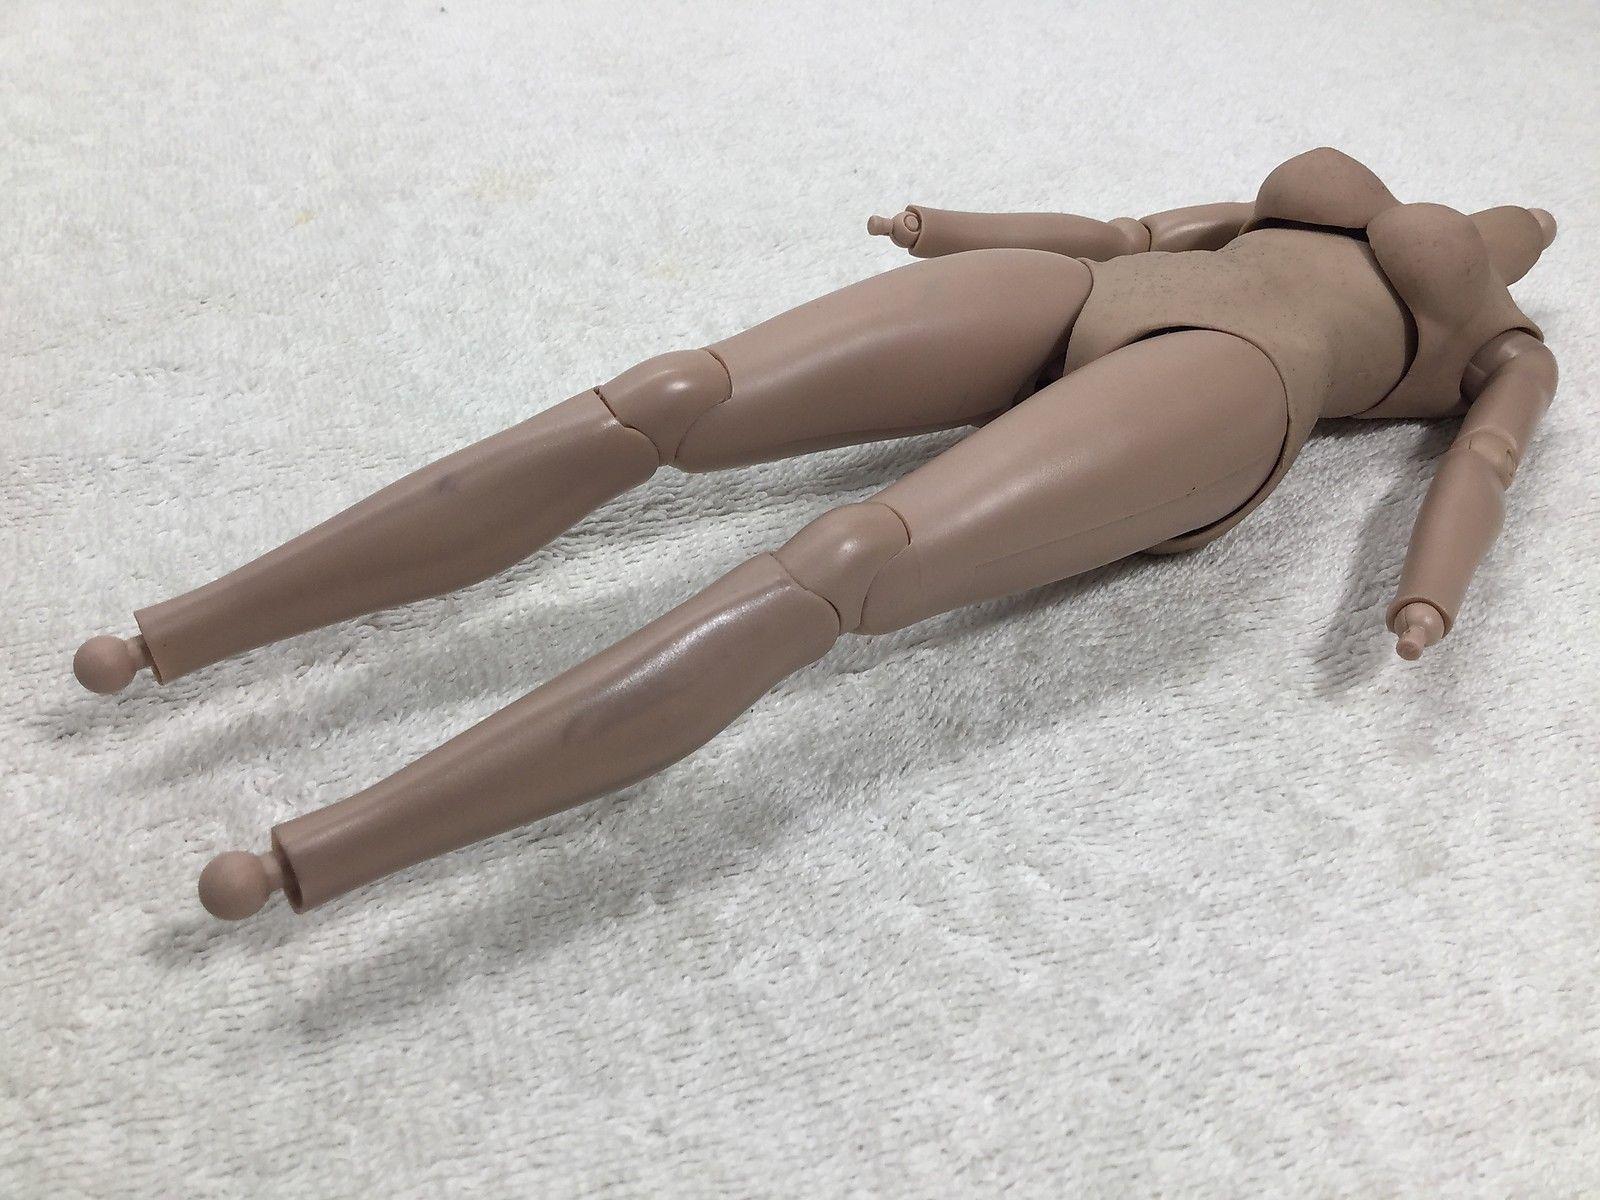 Iron Man 2 Black Widow Body MMS 124 1/6th Scale Accessory - Hot Toys